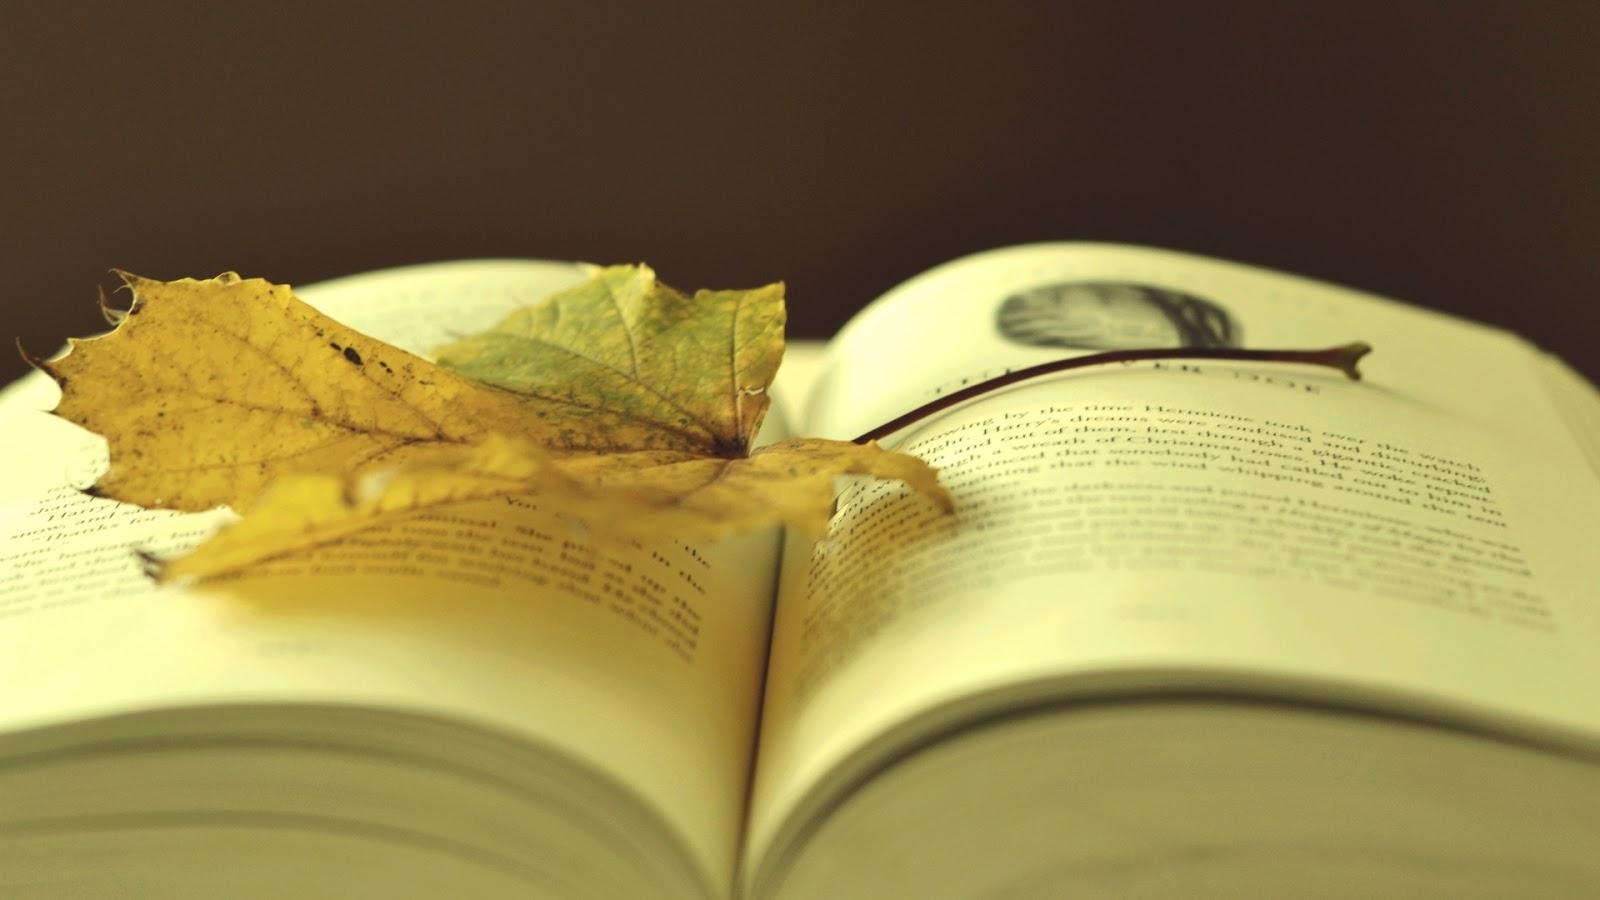 Leaf On A Book